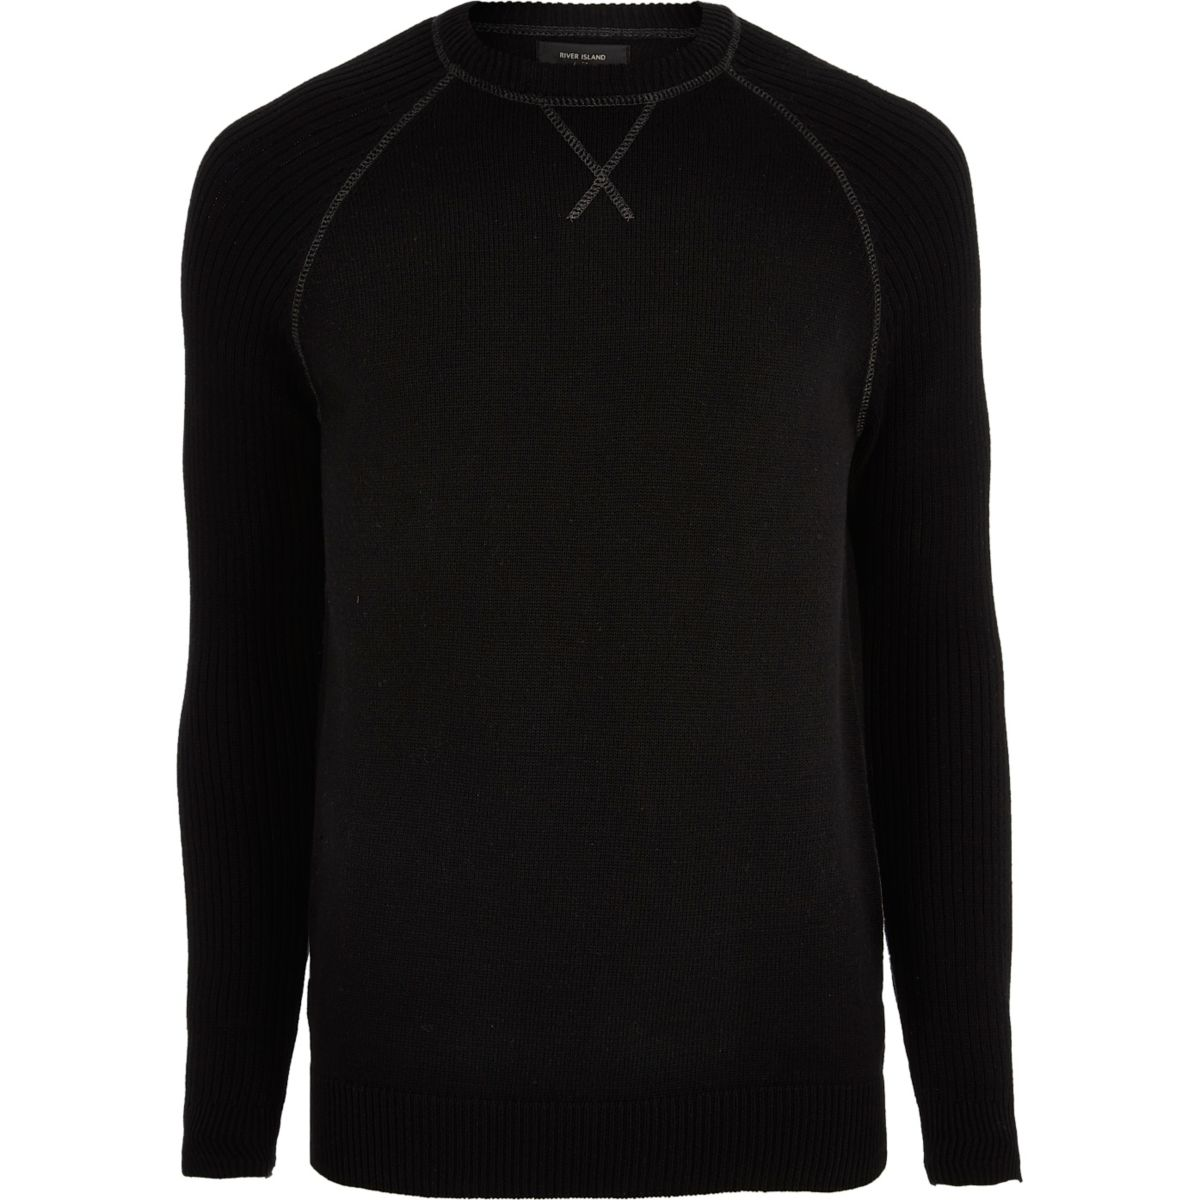 Black knit raglan sleeve jumper